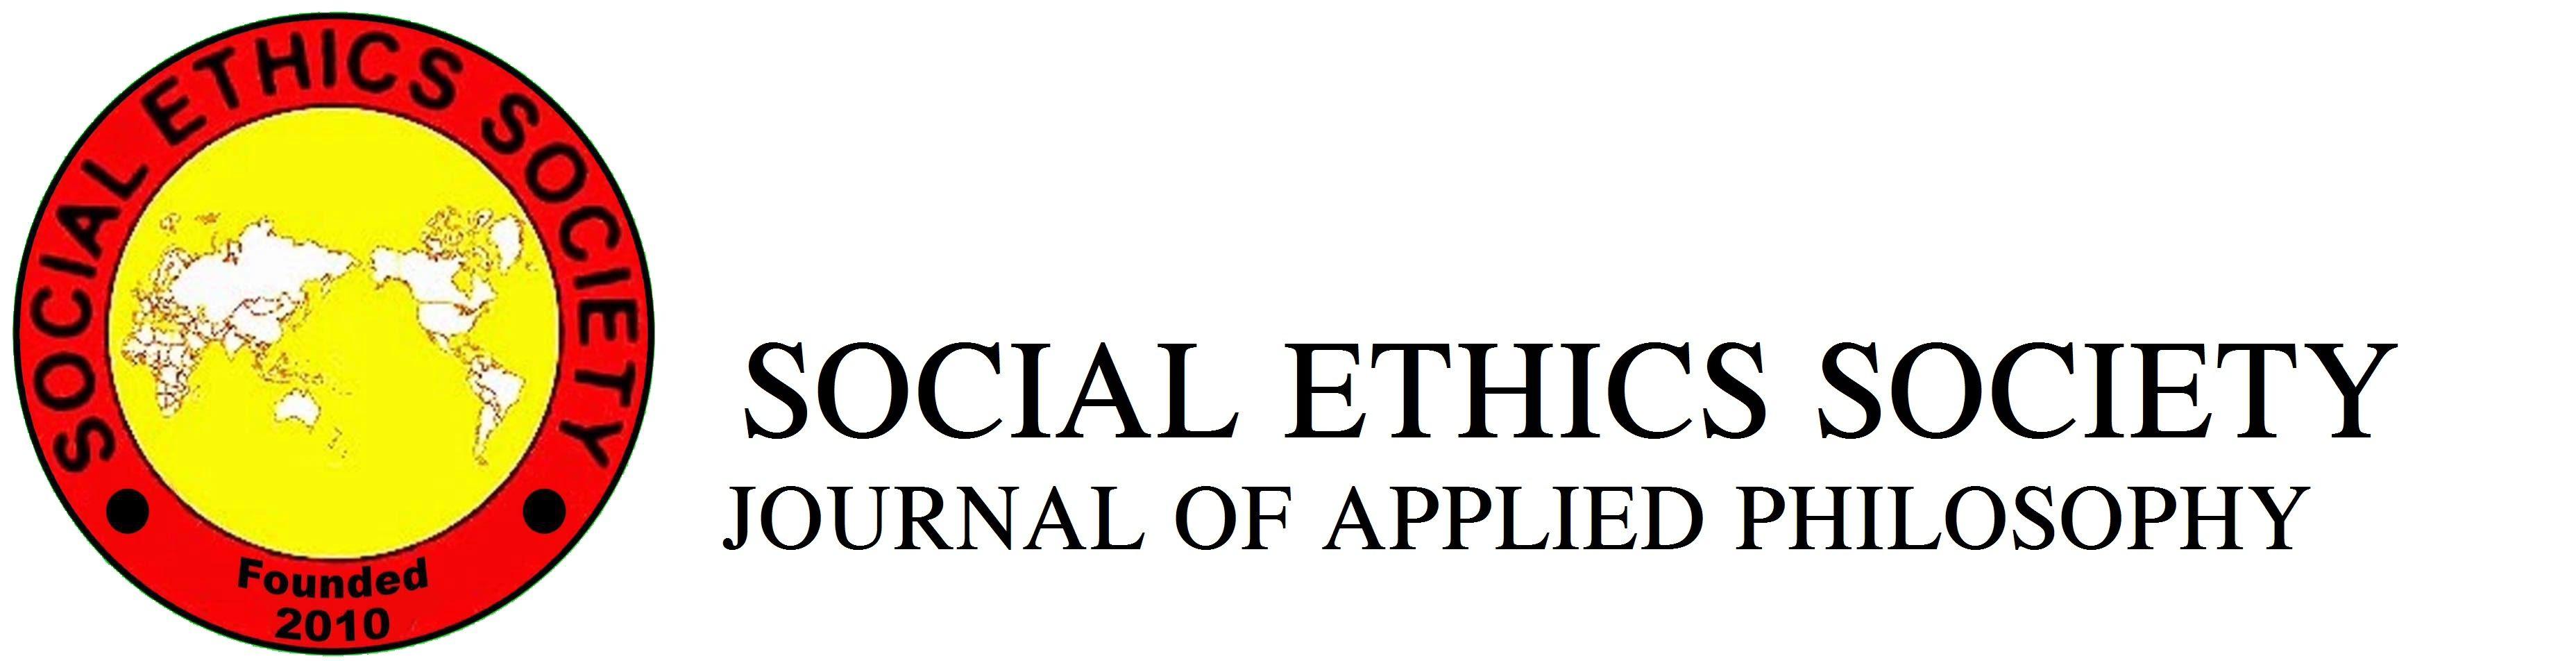 SOCIAL ETHICS SOCIETY